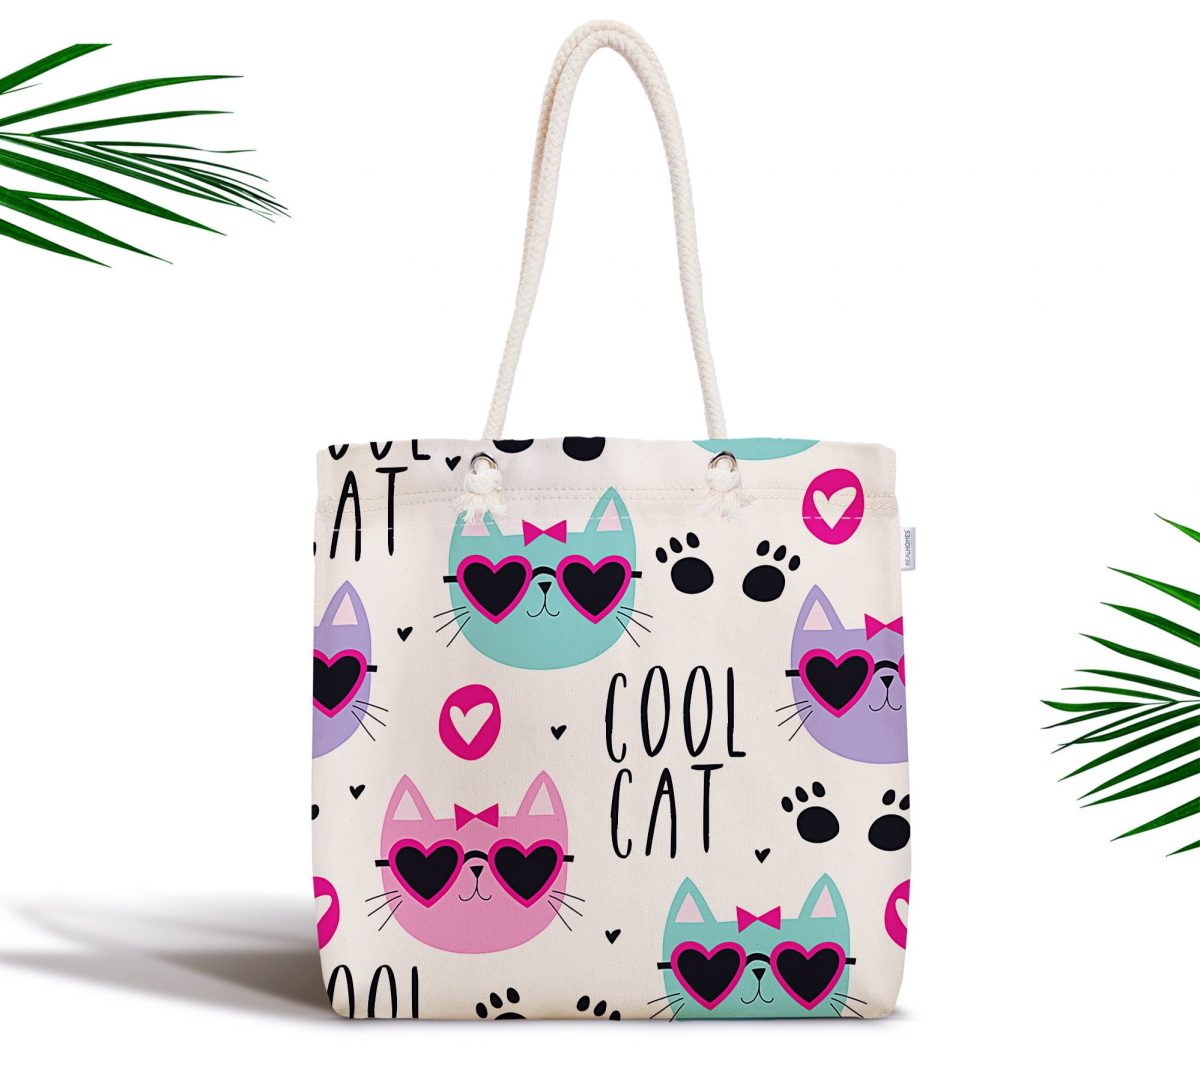 Cool Cat Dijital Baskılı Fermuarlı Modern Kumaş Çanta Realhomes